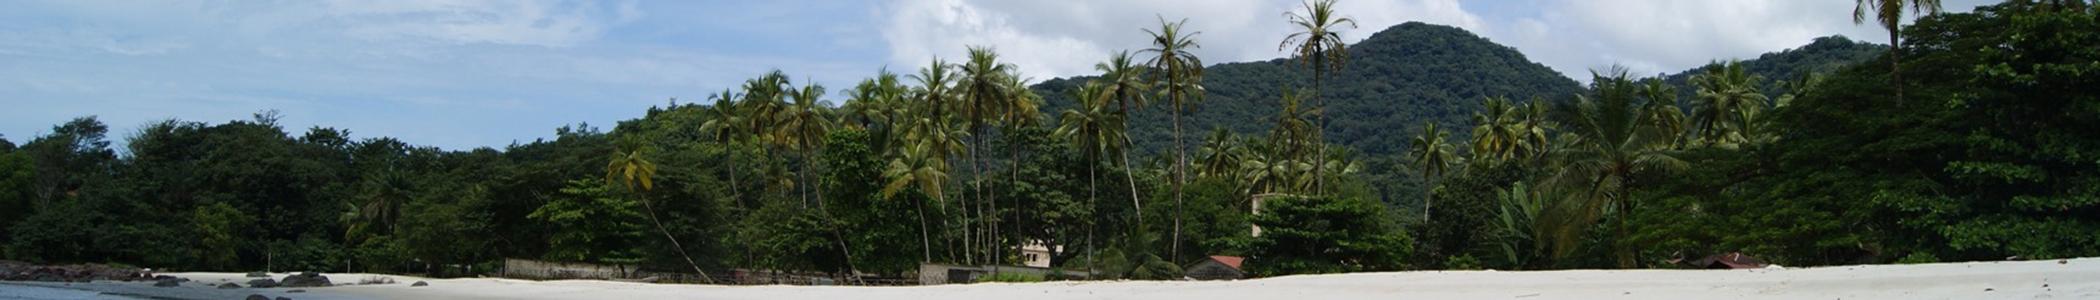 File:Sierra Leone banner Village beach.jpg - Wikimedia Commonsbanner village